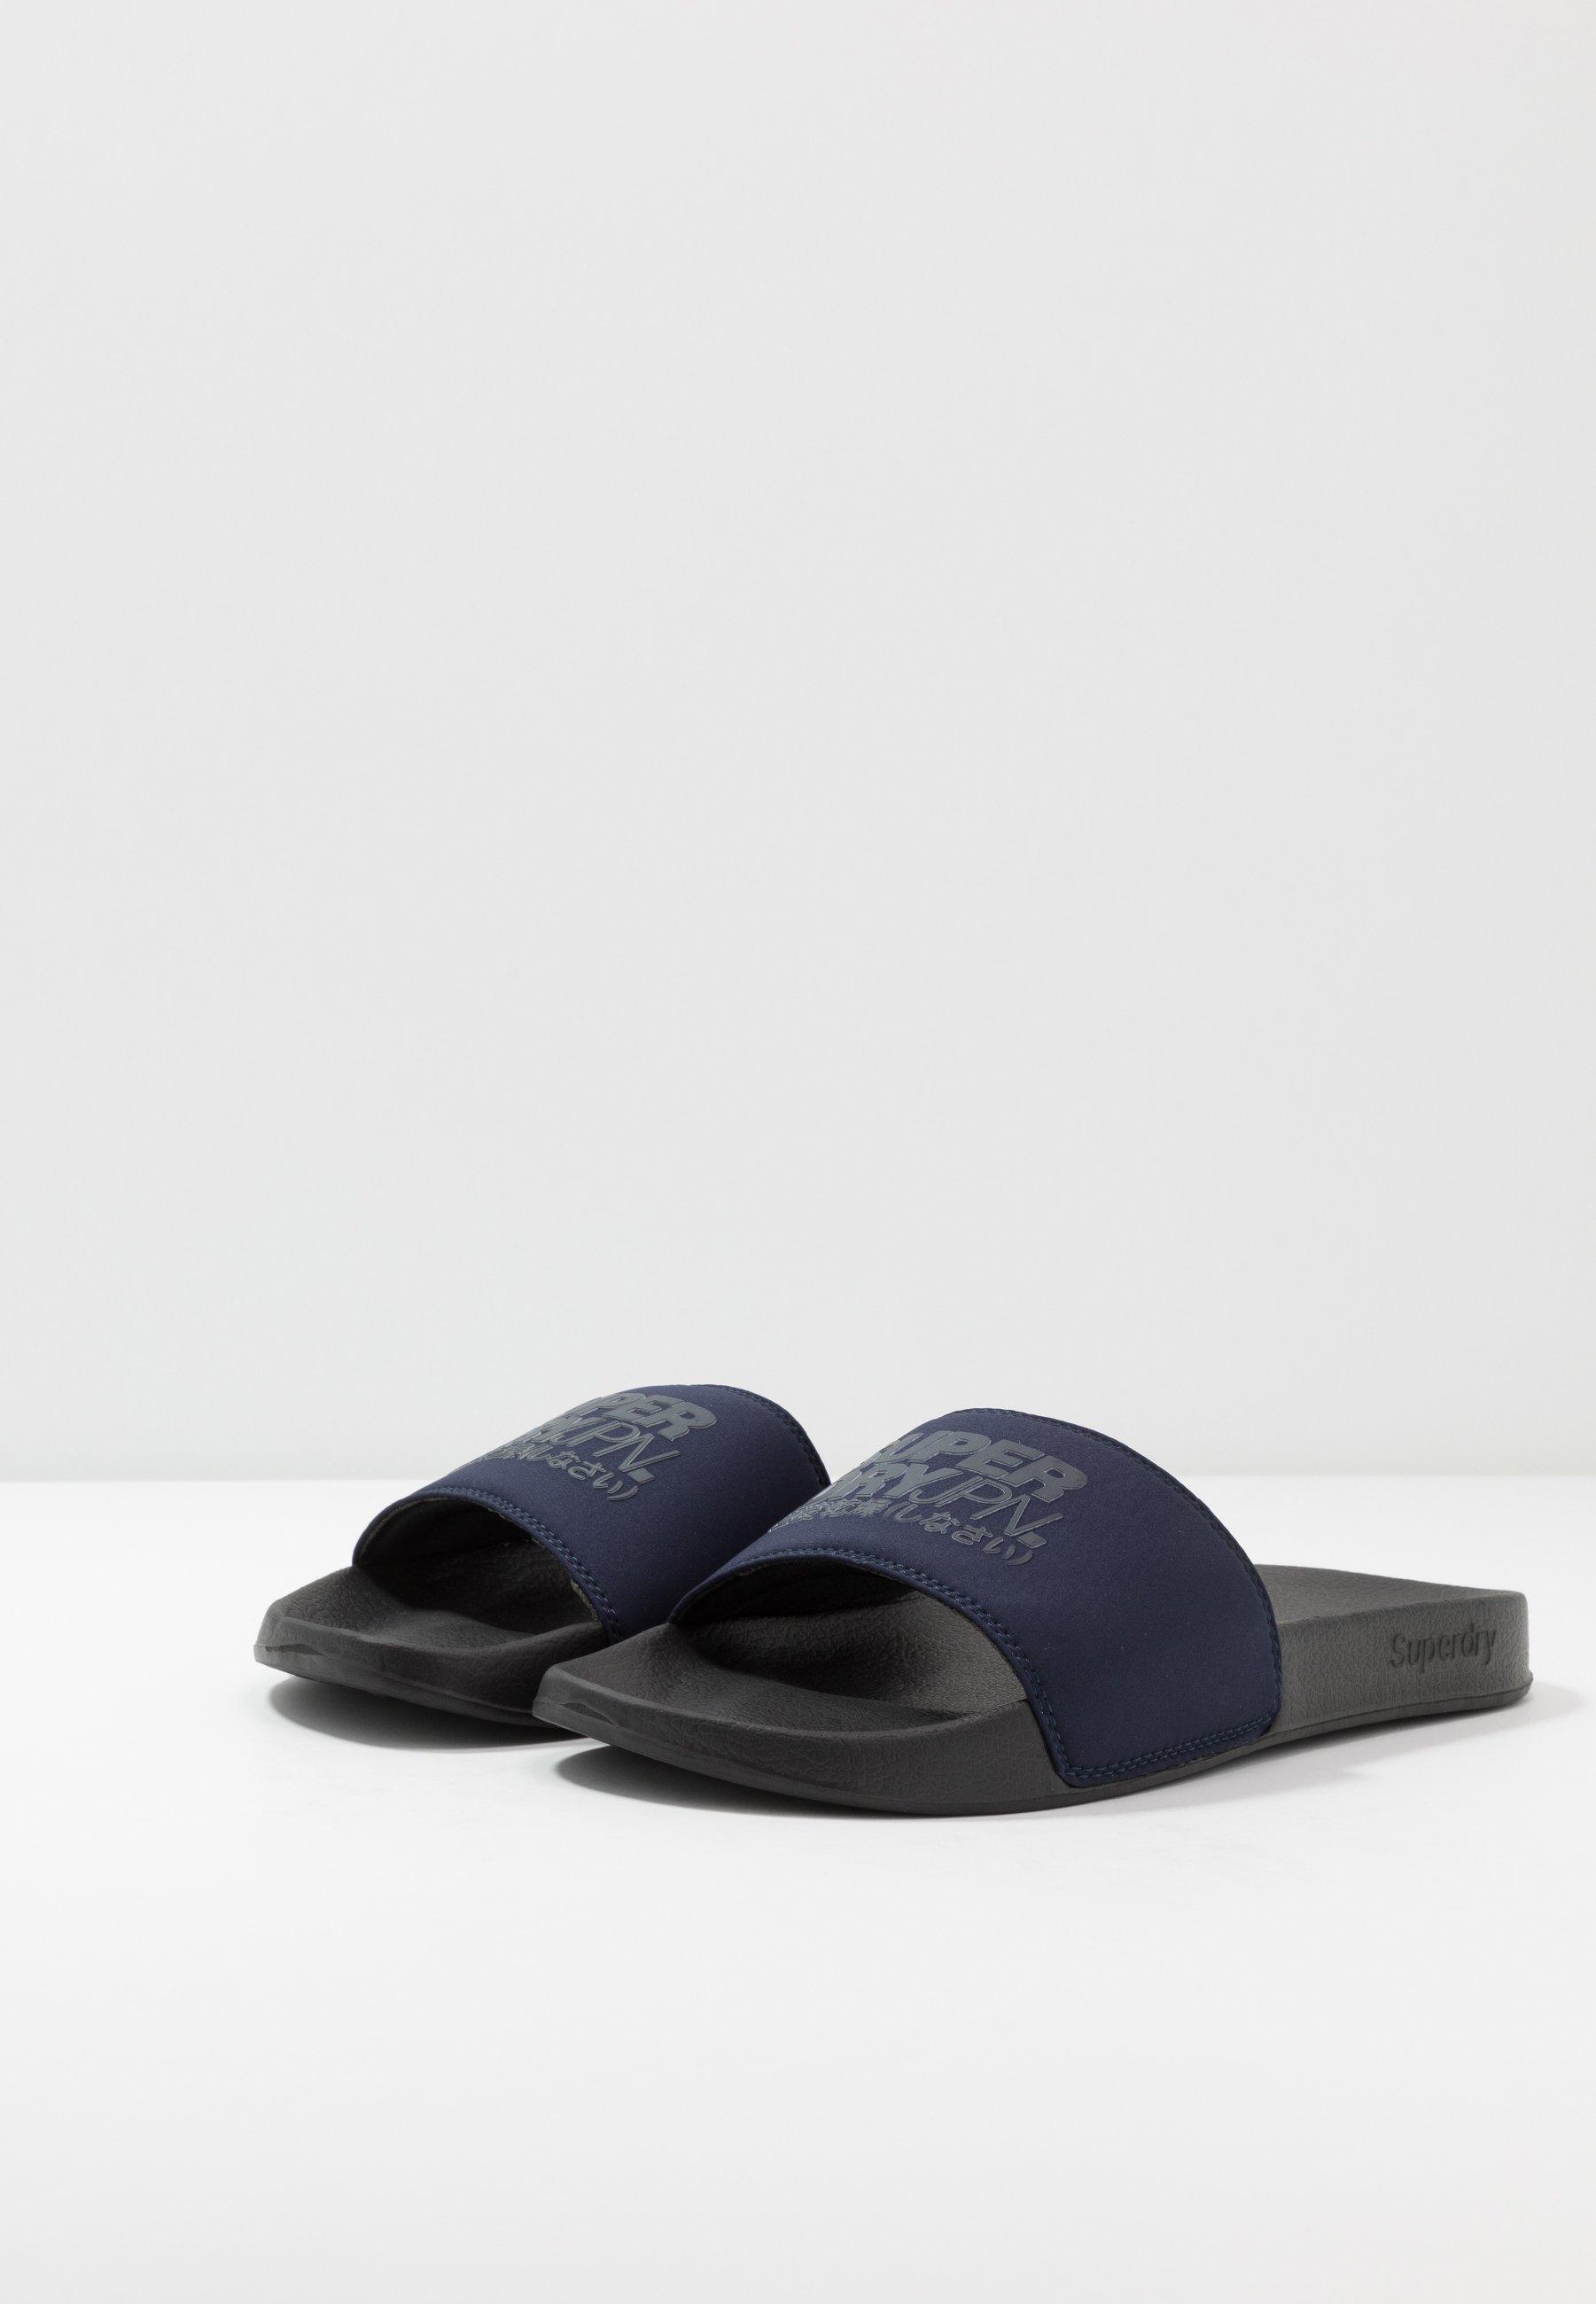 Superdry Sorrento Pool Slide - Mules Black/nautical Navy